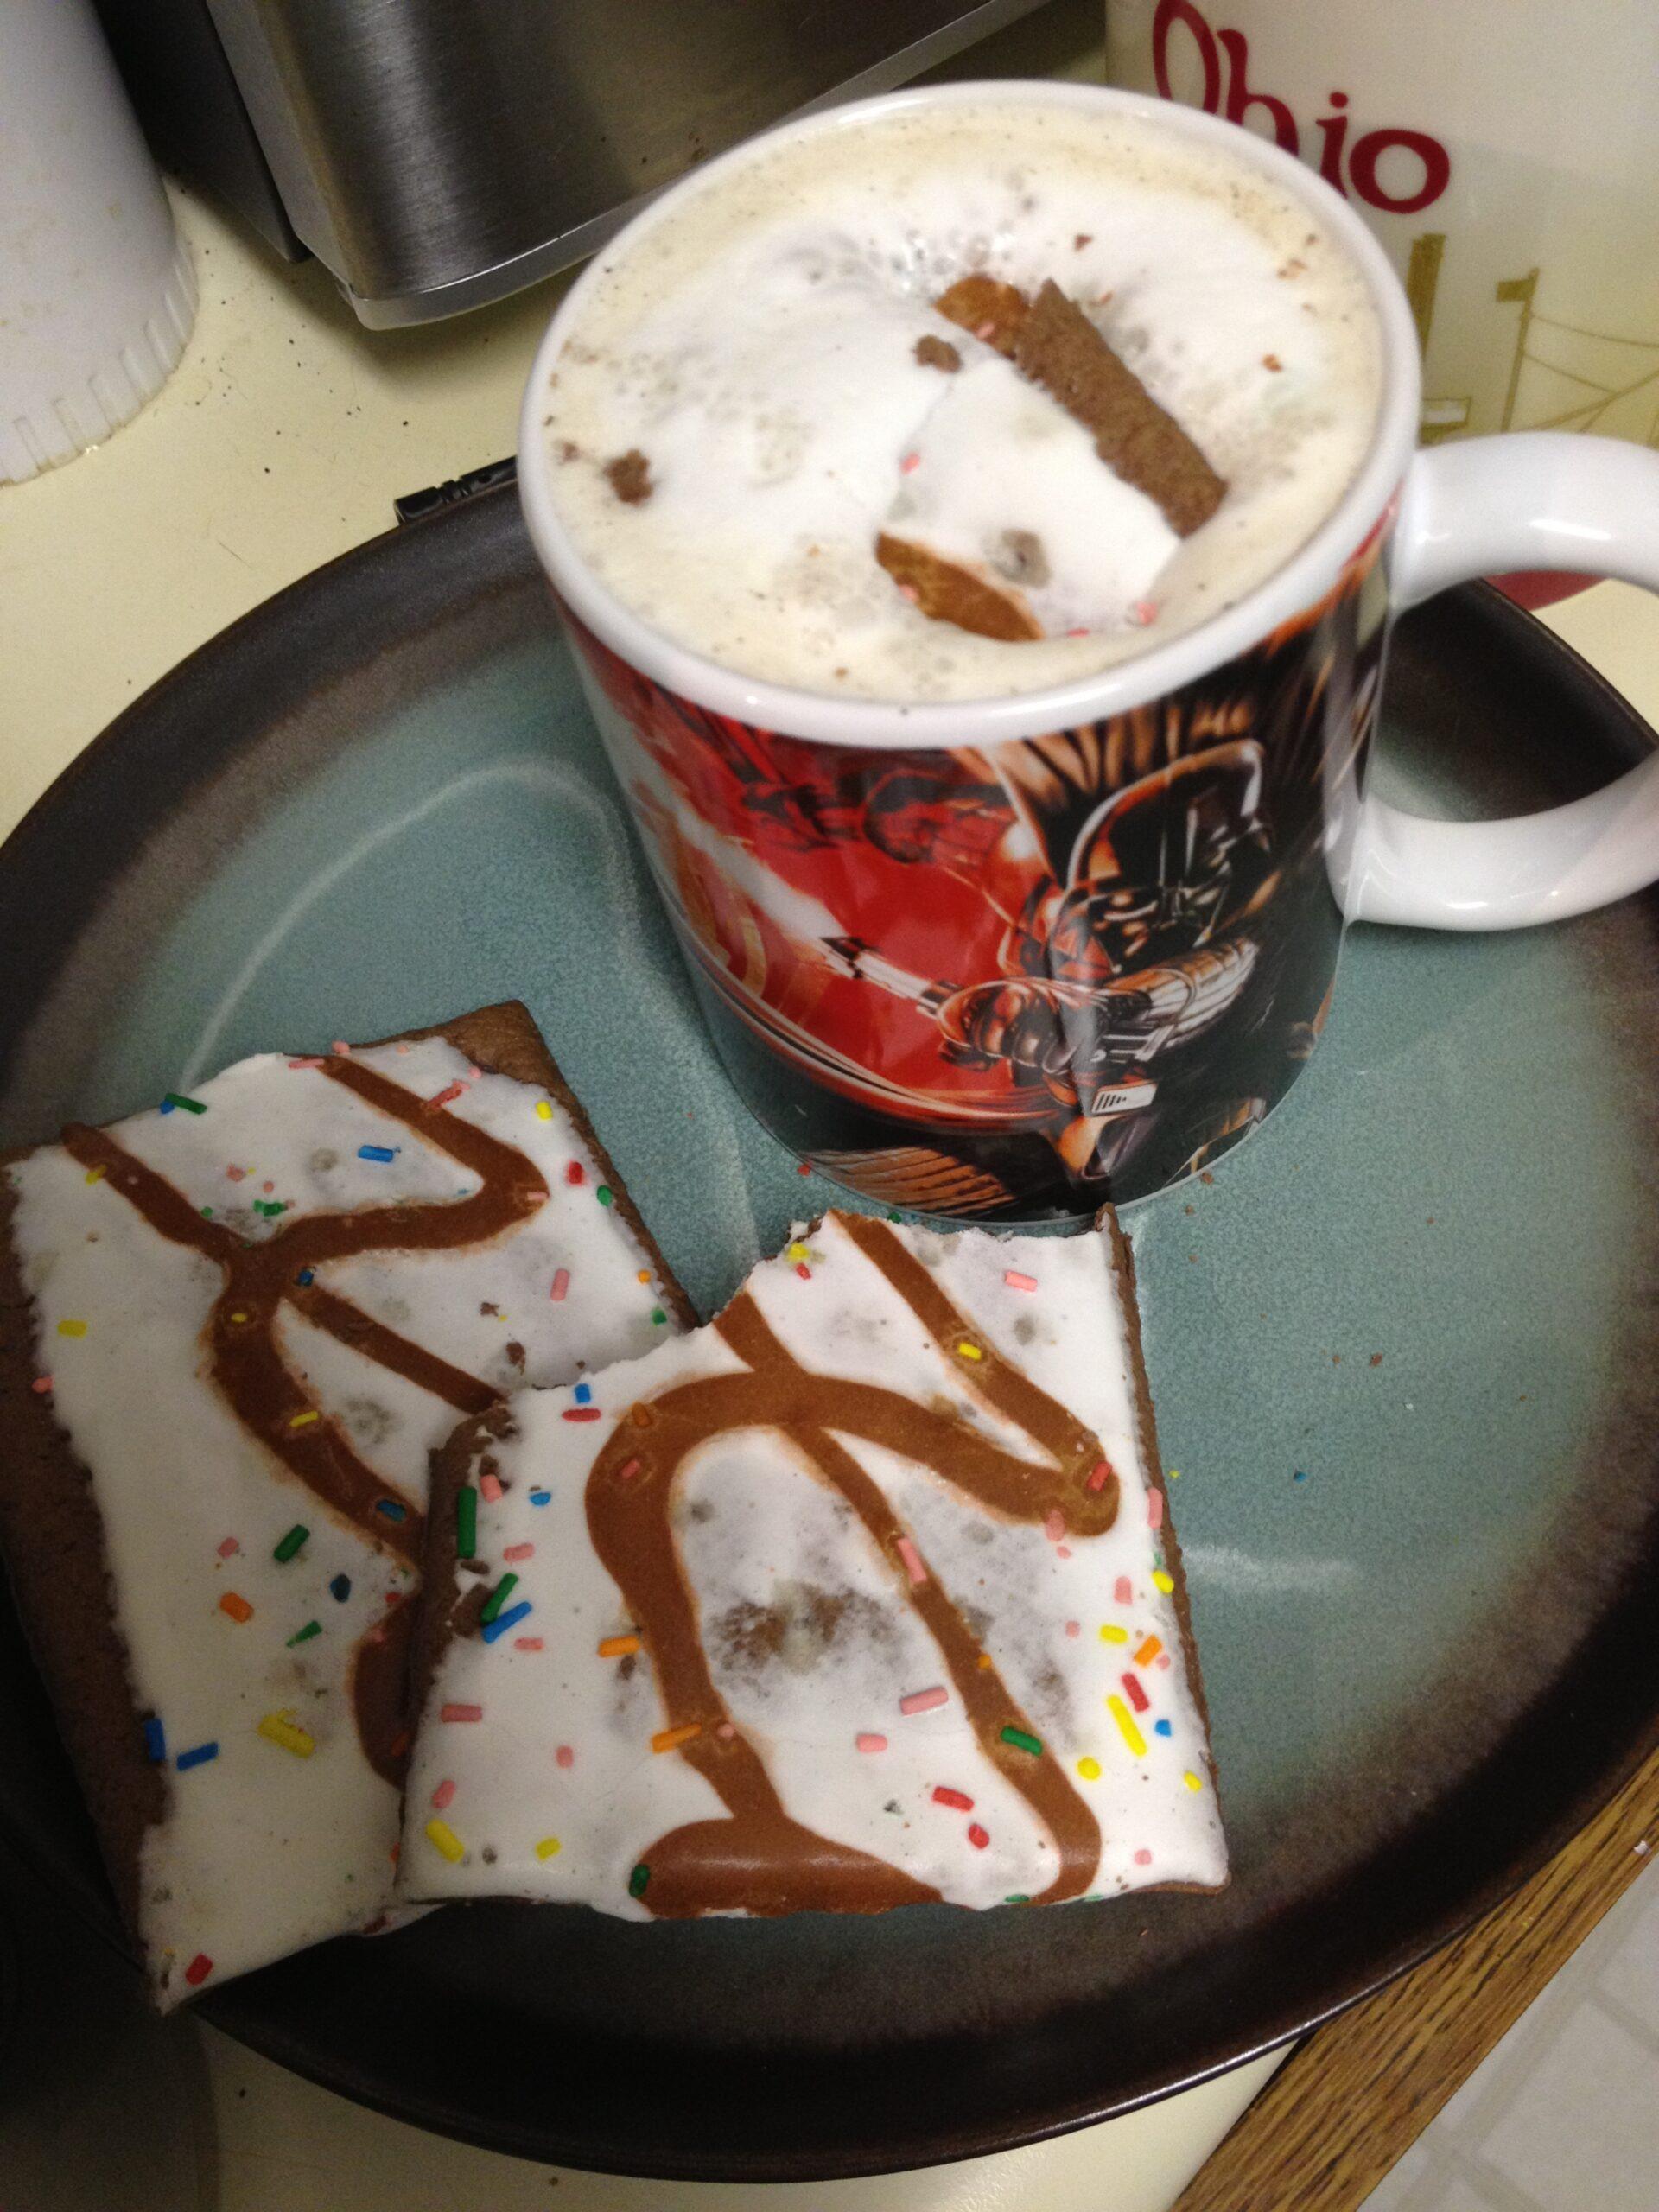 Thor's Hot Fudge Sundae Poptart Latte Recipe